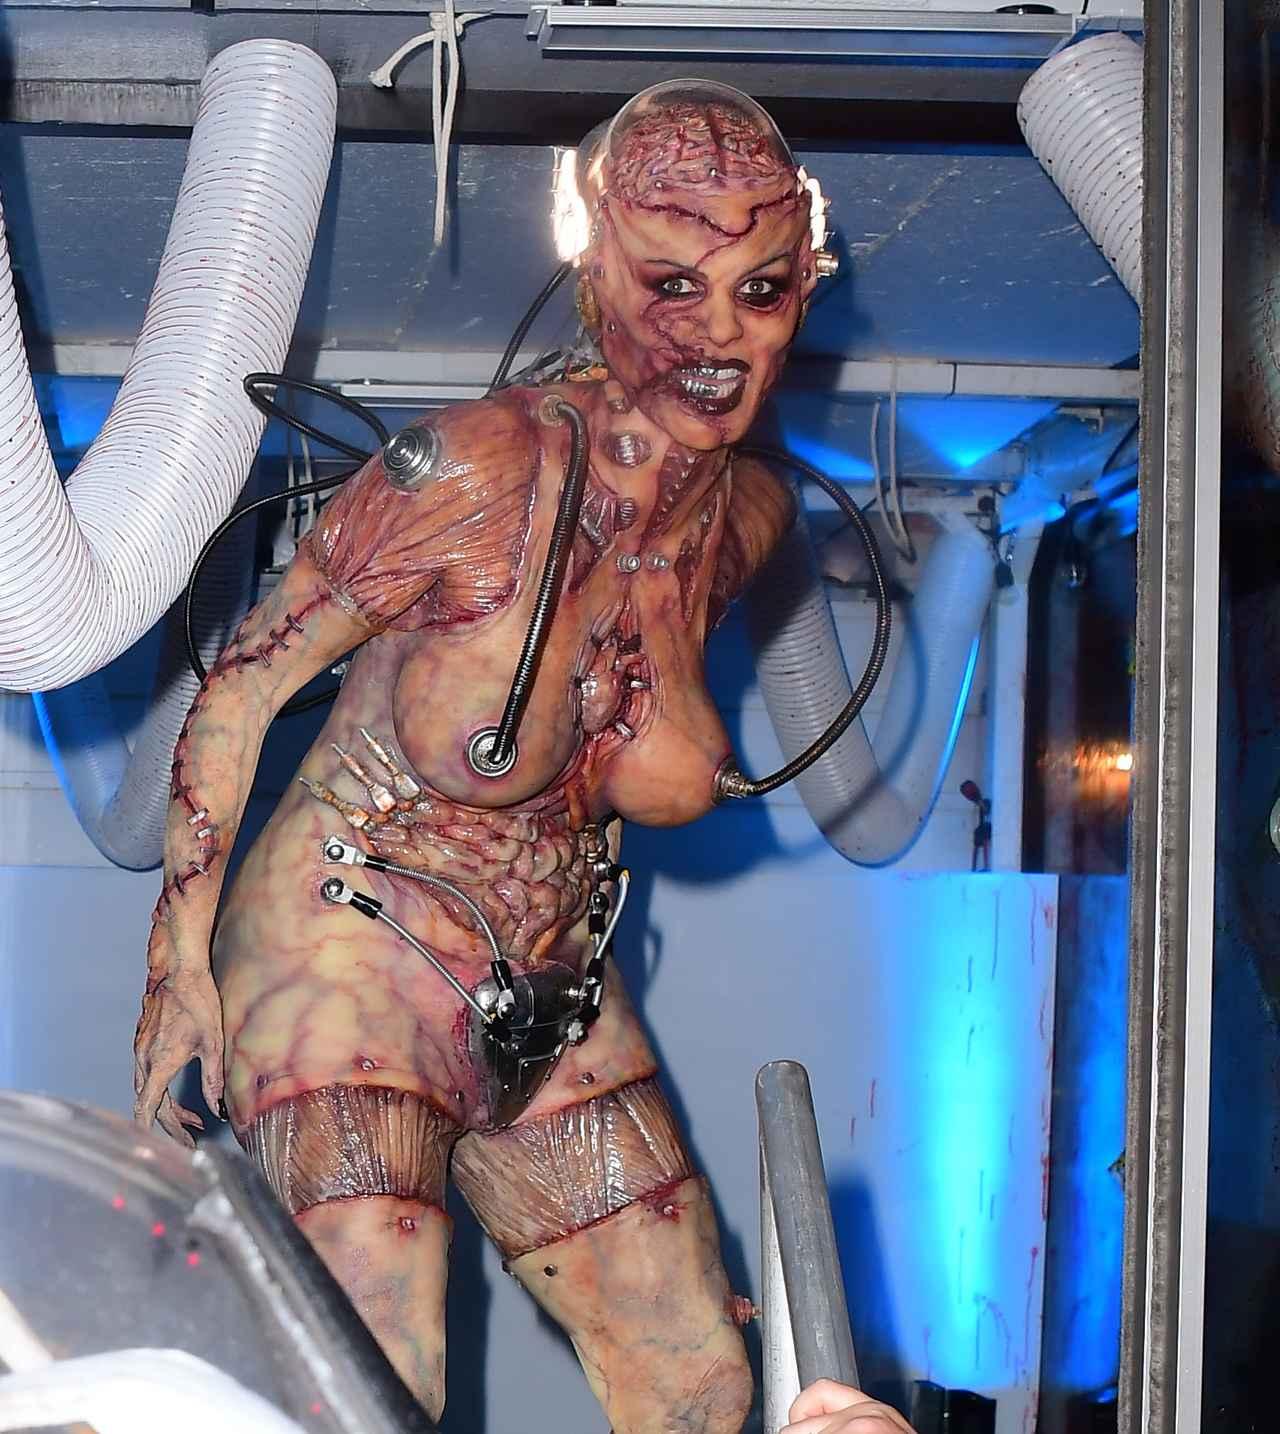 Images : 17番目の画像 - 「ハロウィンの女王」ハイディ・クルムの仮装が怖すぎる - フロントロウ -海外セレブ情報を発信